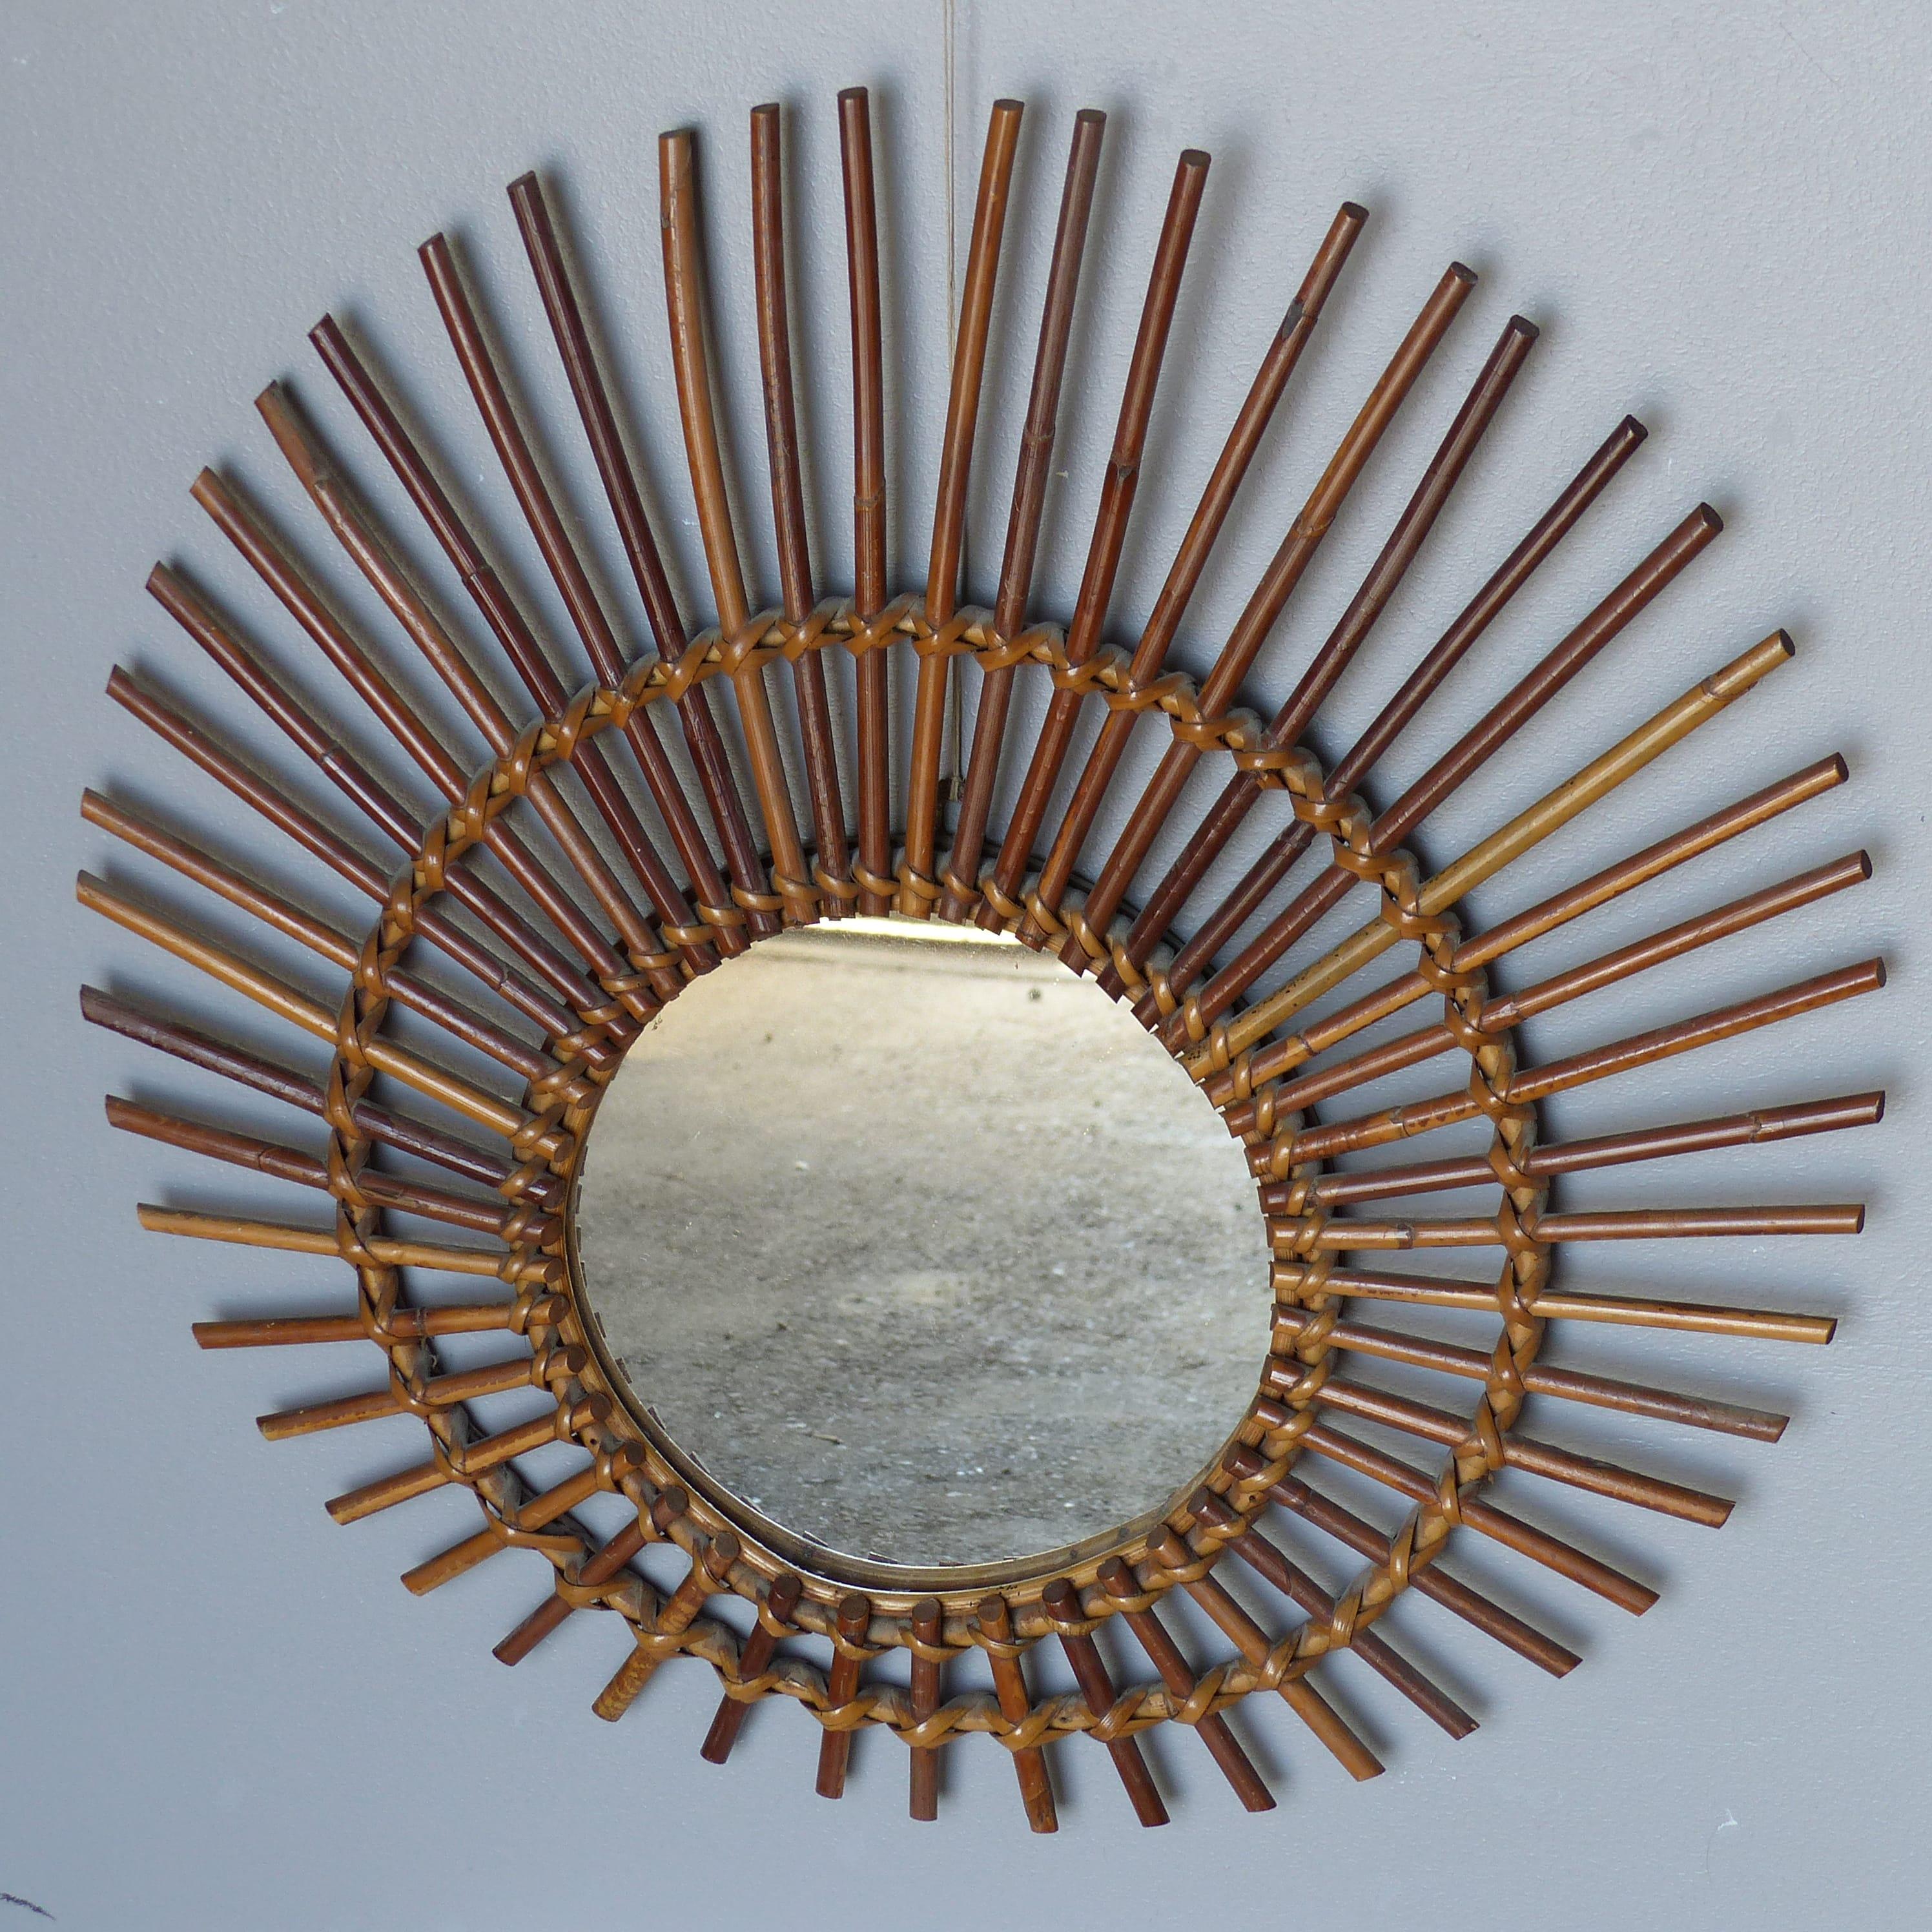 miroir soleil en rotin lignedebrocante brocante en ligne chine pour vous meubles vintage et. Black Bedroom Furniture Sets. Home Design Ideas